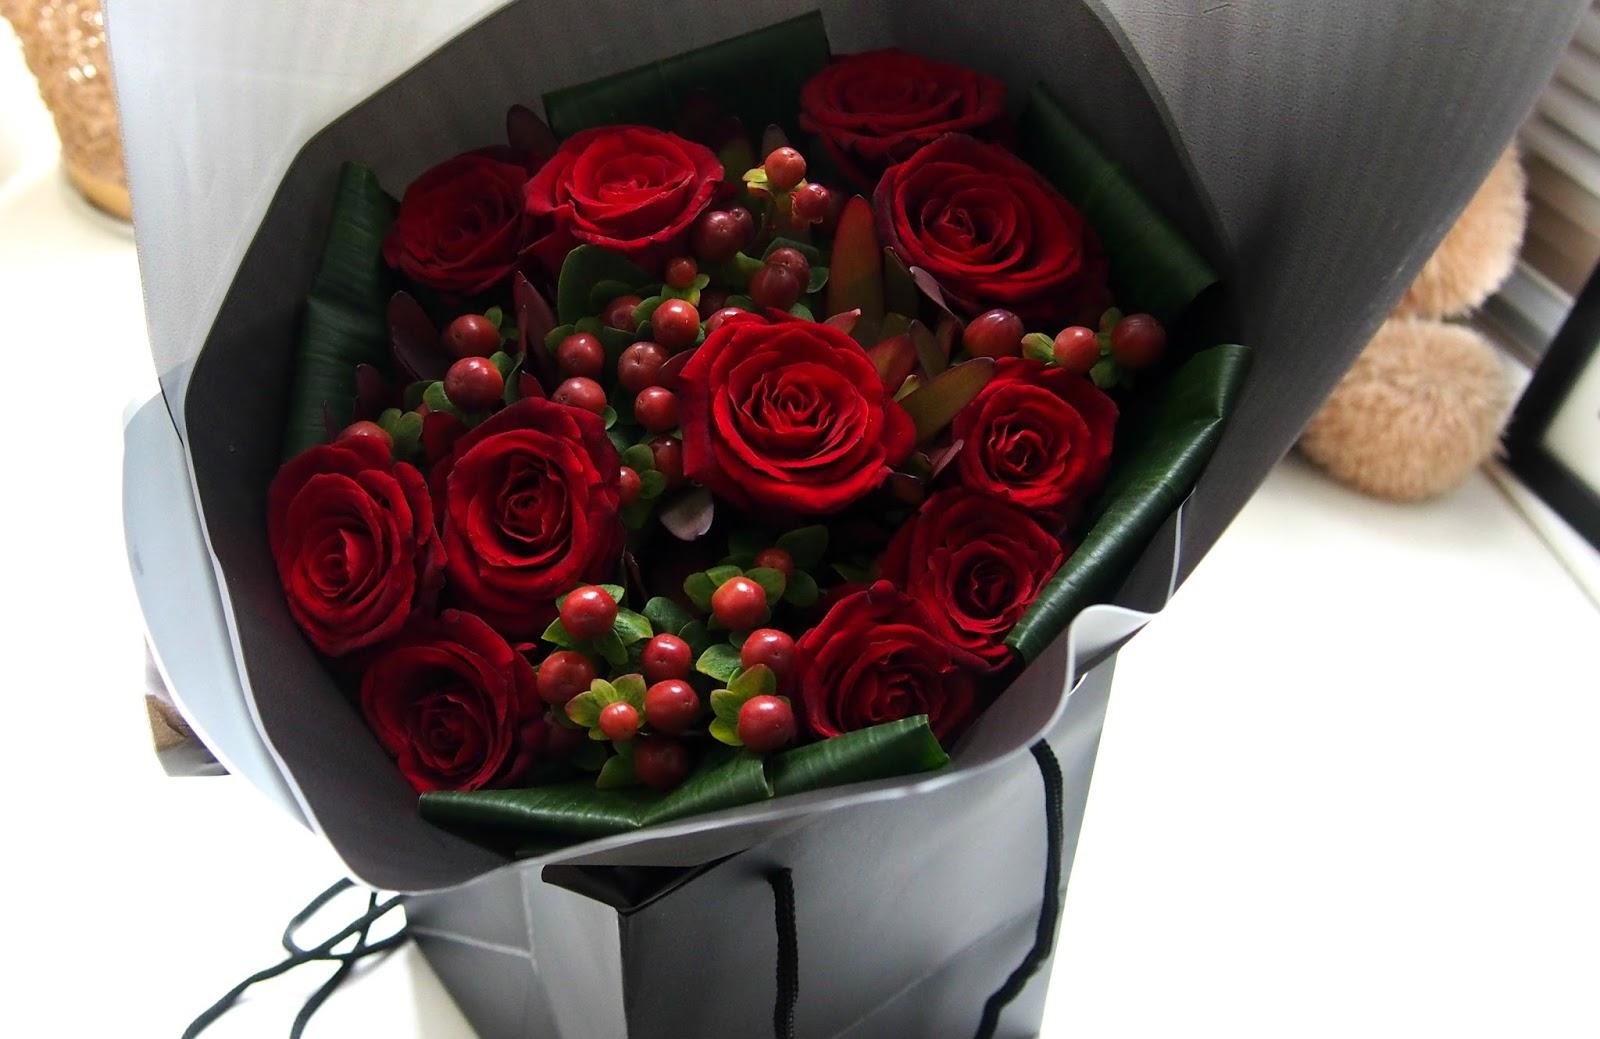 Roses in gift bag